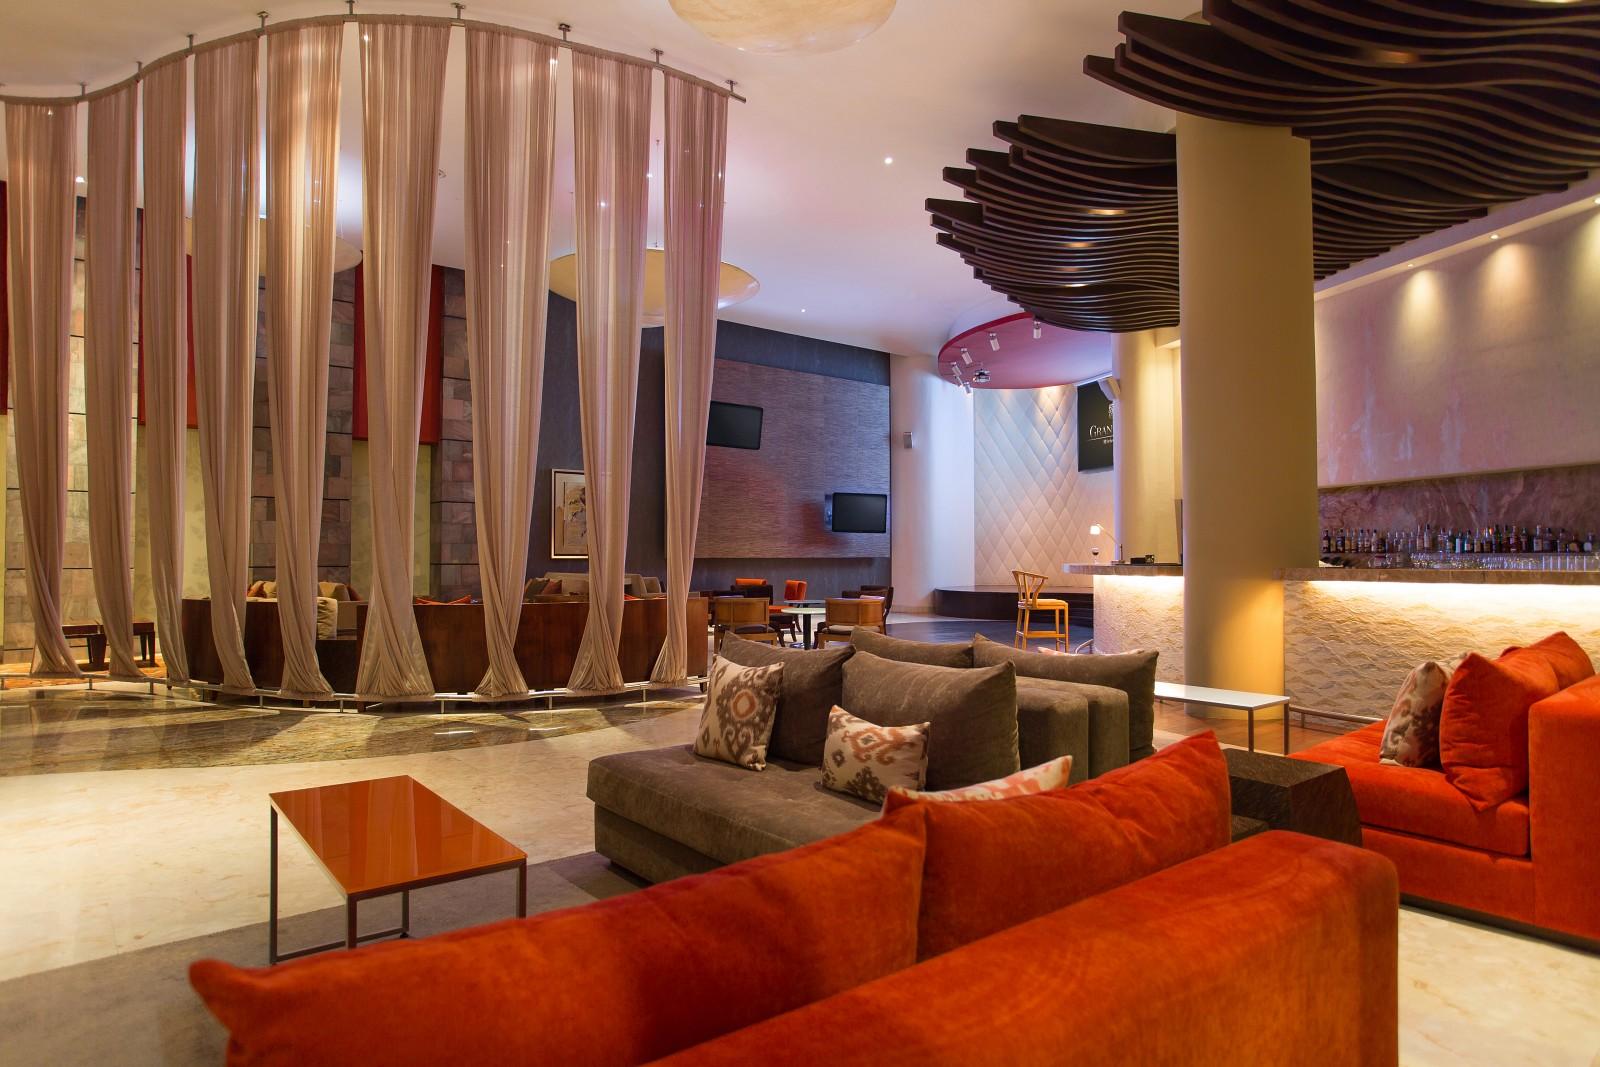 Travel Agency All-Inclusive Resort Grand Velas Riviera Maya 067